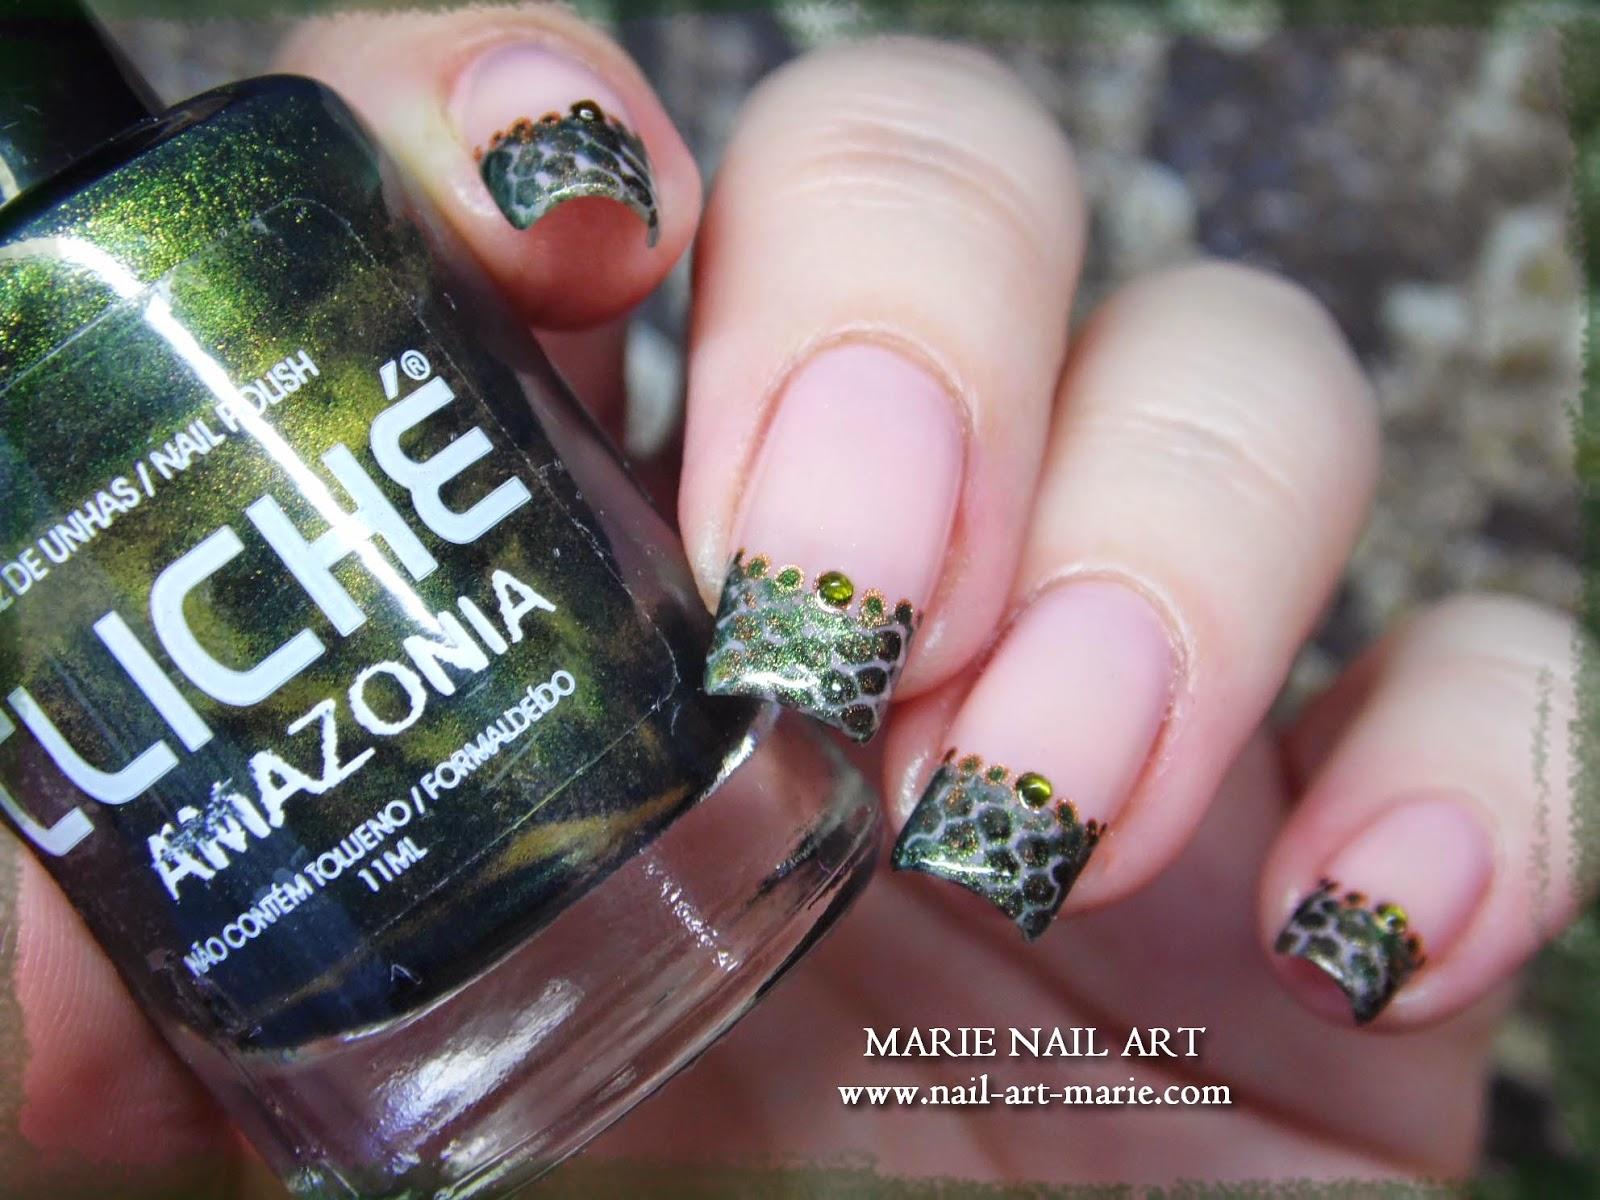 nail art effet peau de serpent5